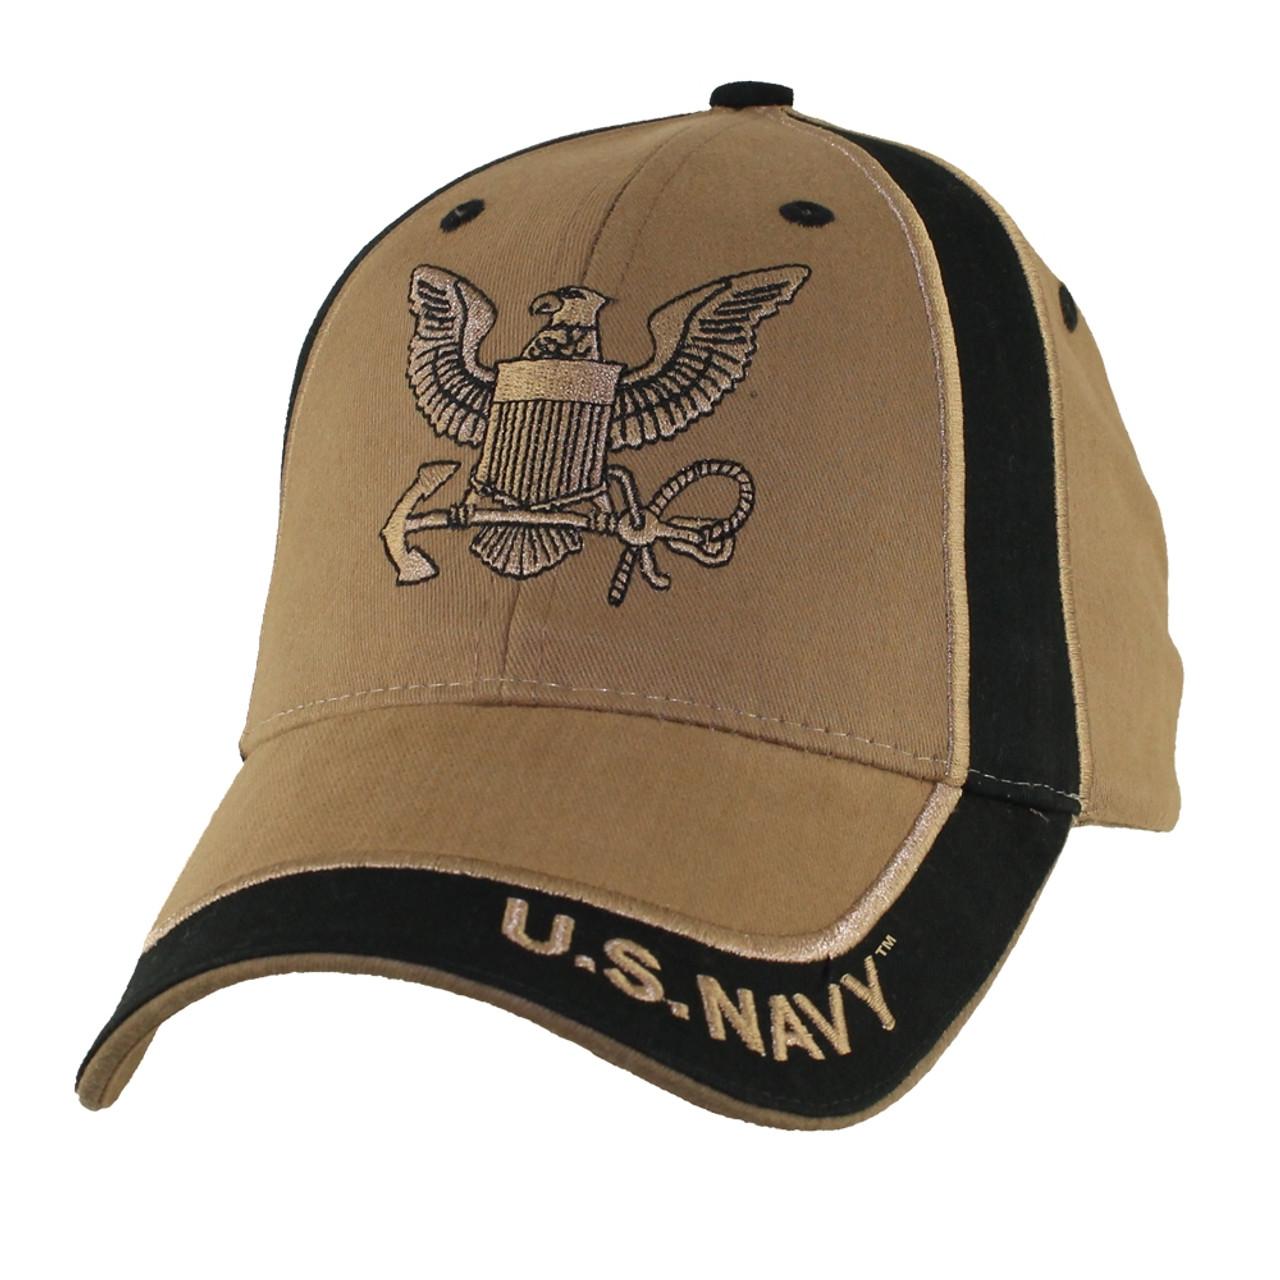 6664 - U S  Navy Cap - Cotton - Coyote/Black